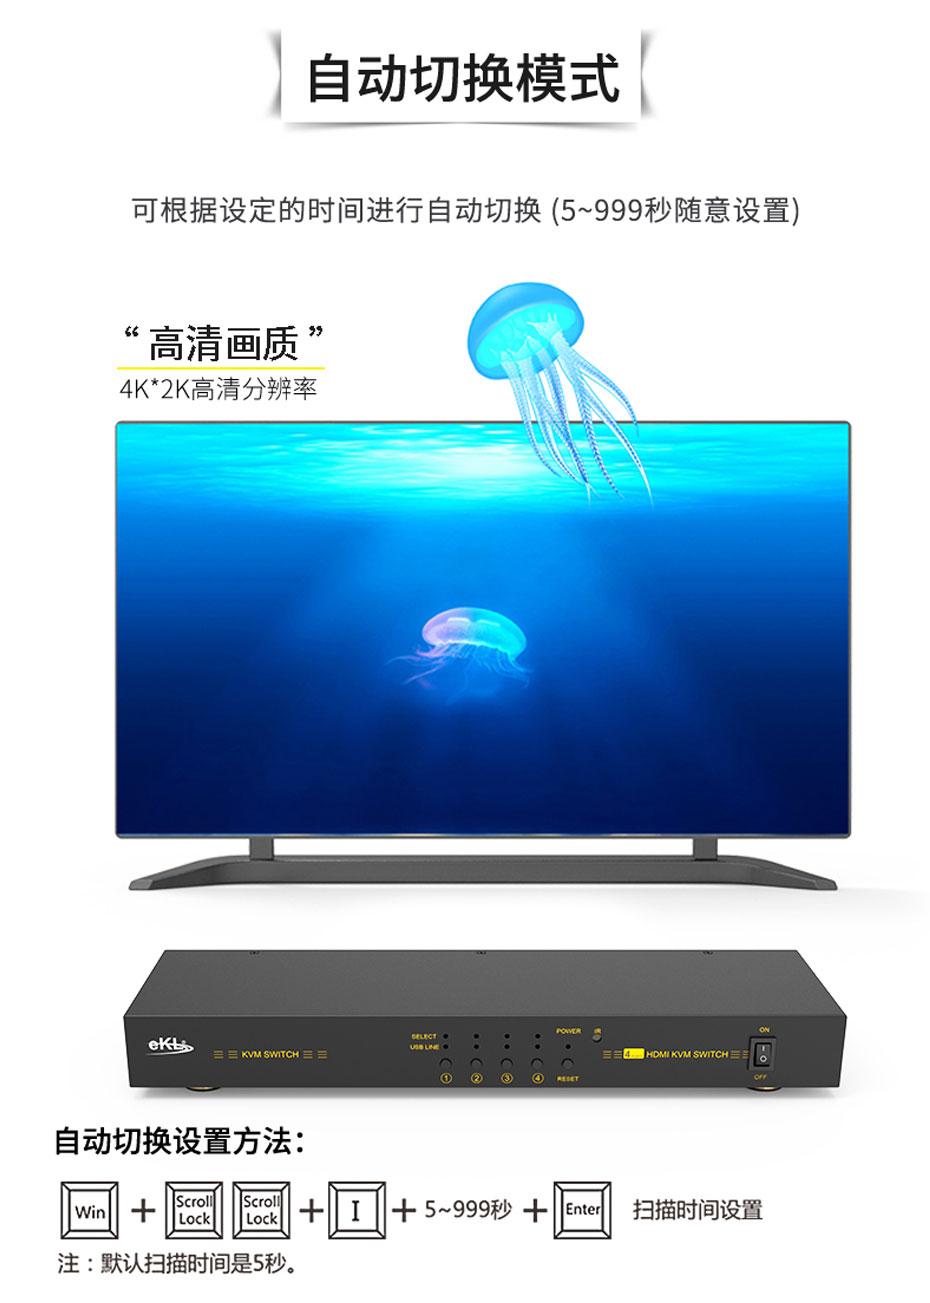 HDMI KVM切换器4进1出41HK自动切换方法设置